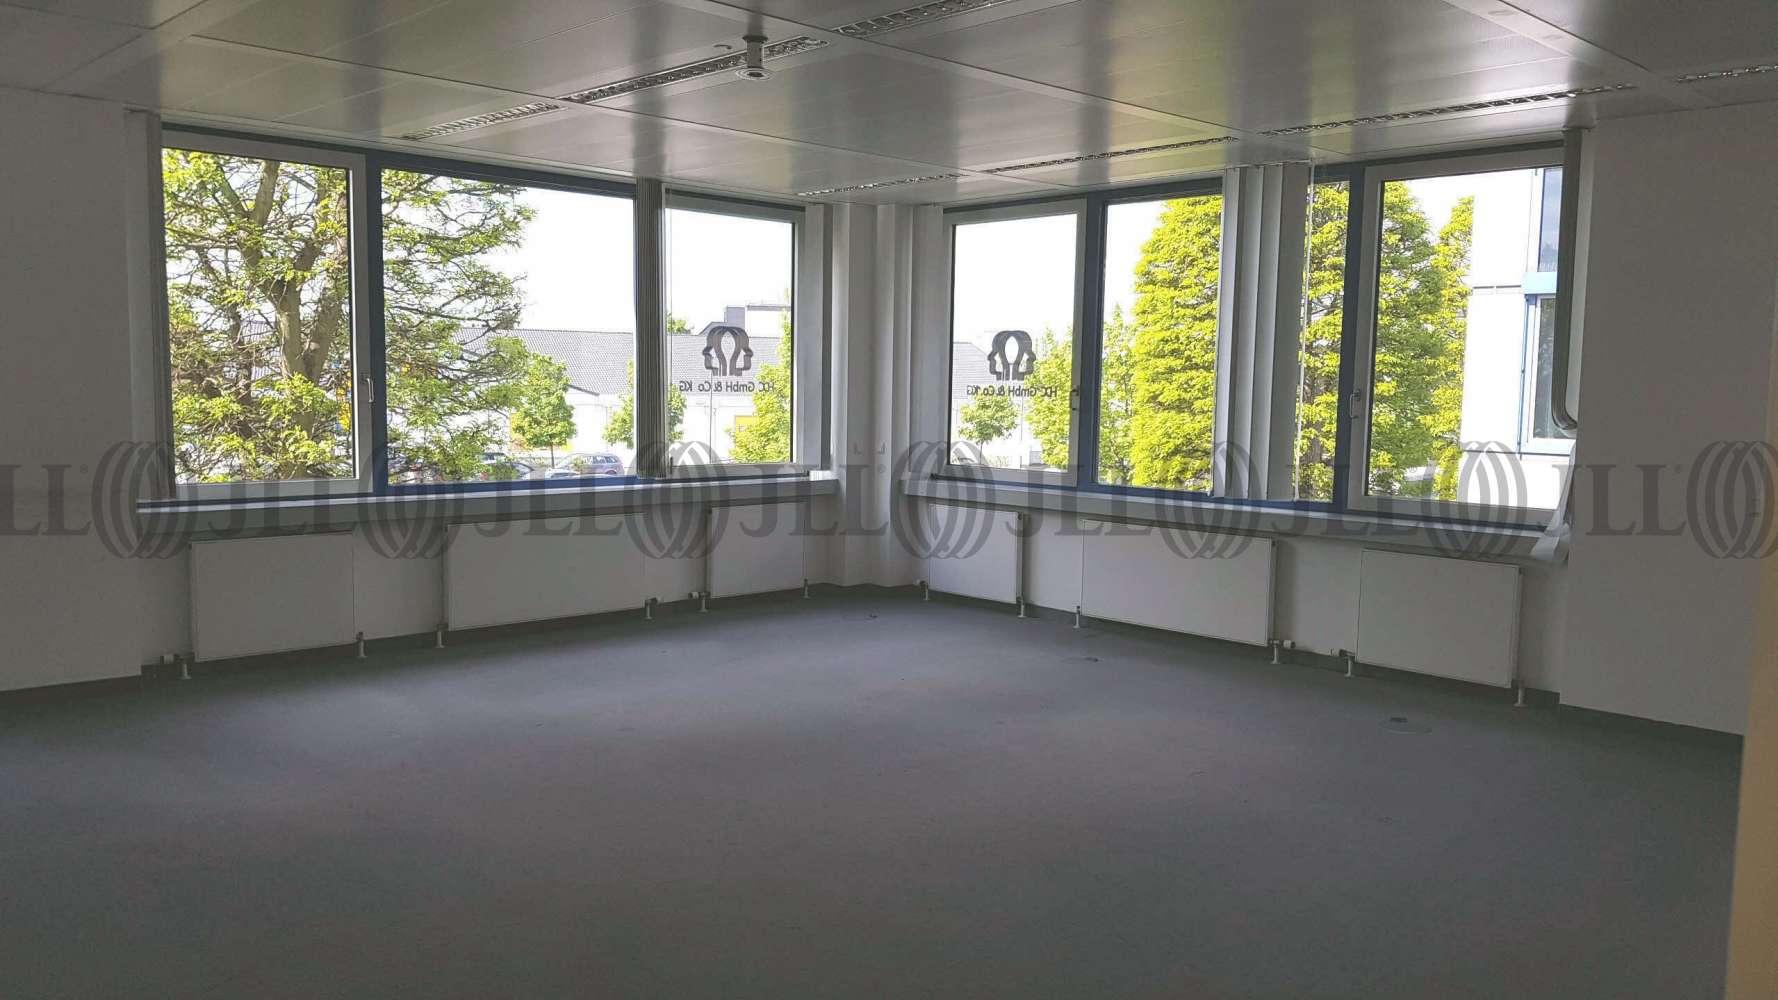 Büros Frankfurt am main, 60437 - Büro - Frankfurt am Main, Nieder-Eschbach - F1908 - 10645644